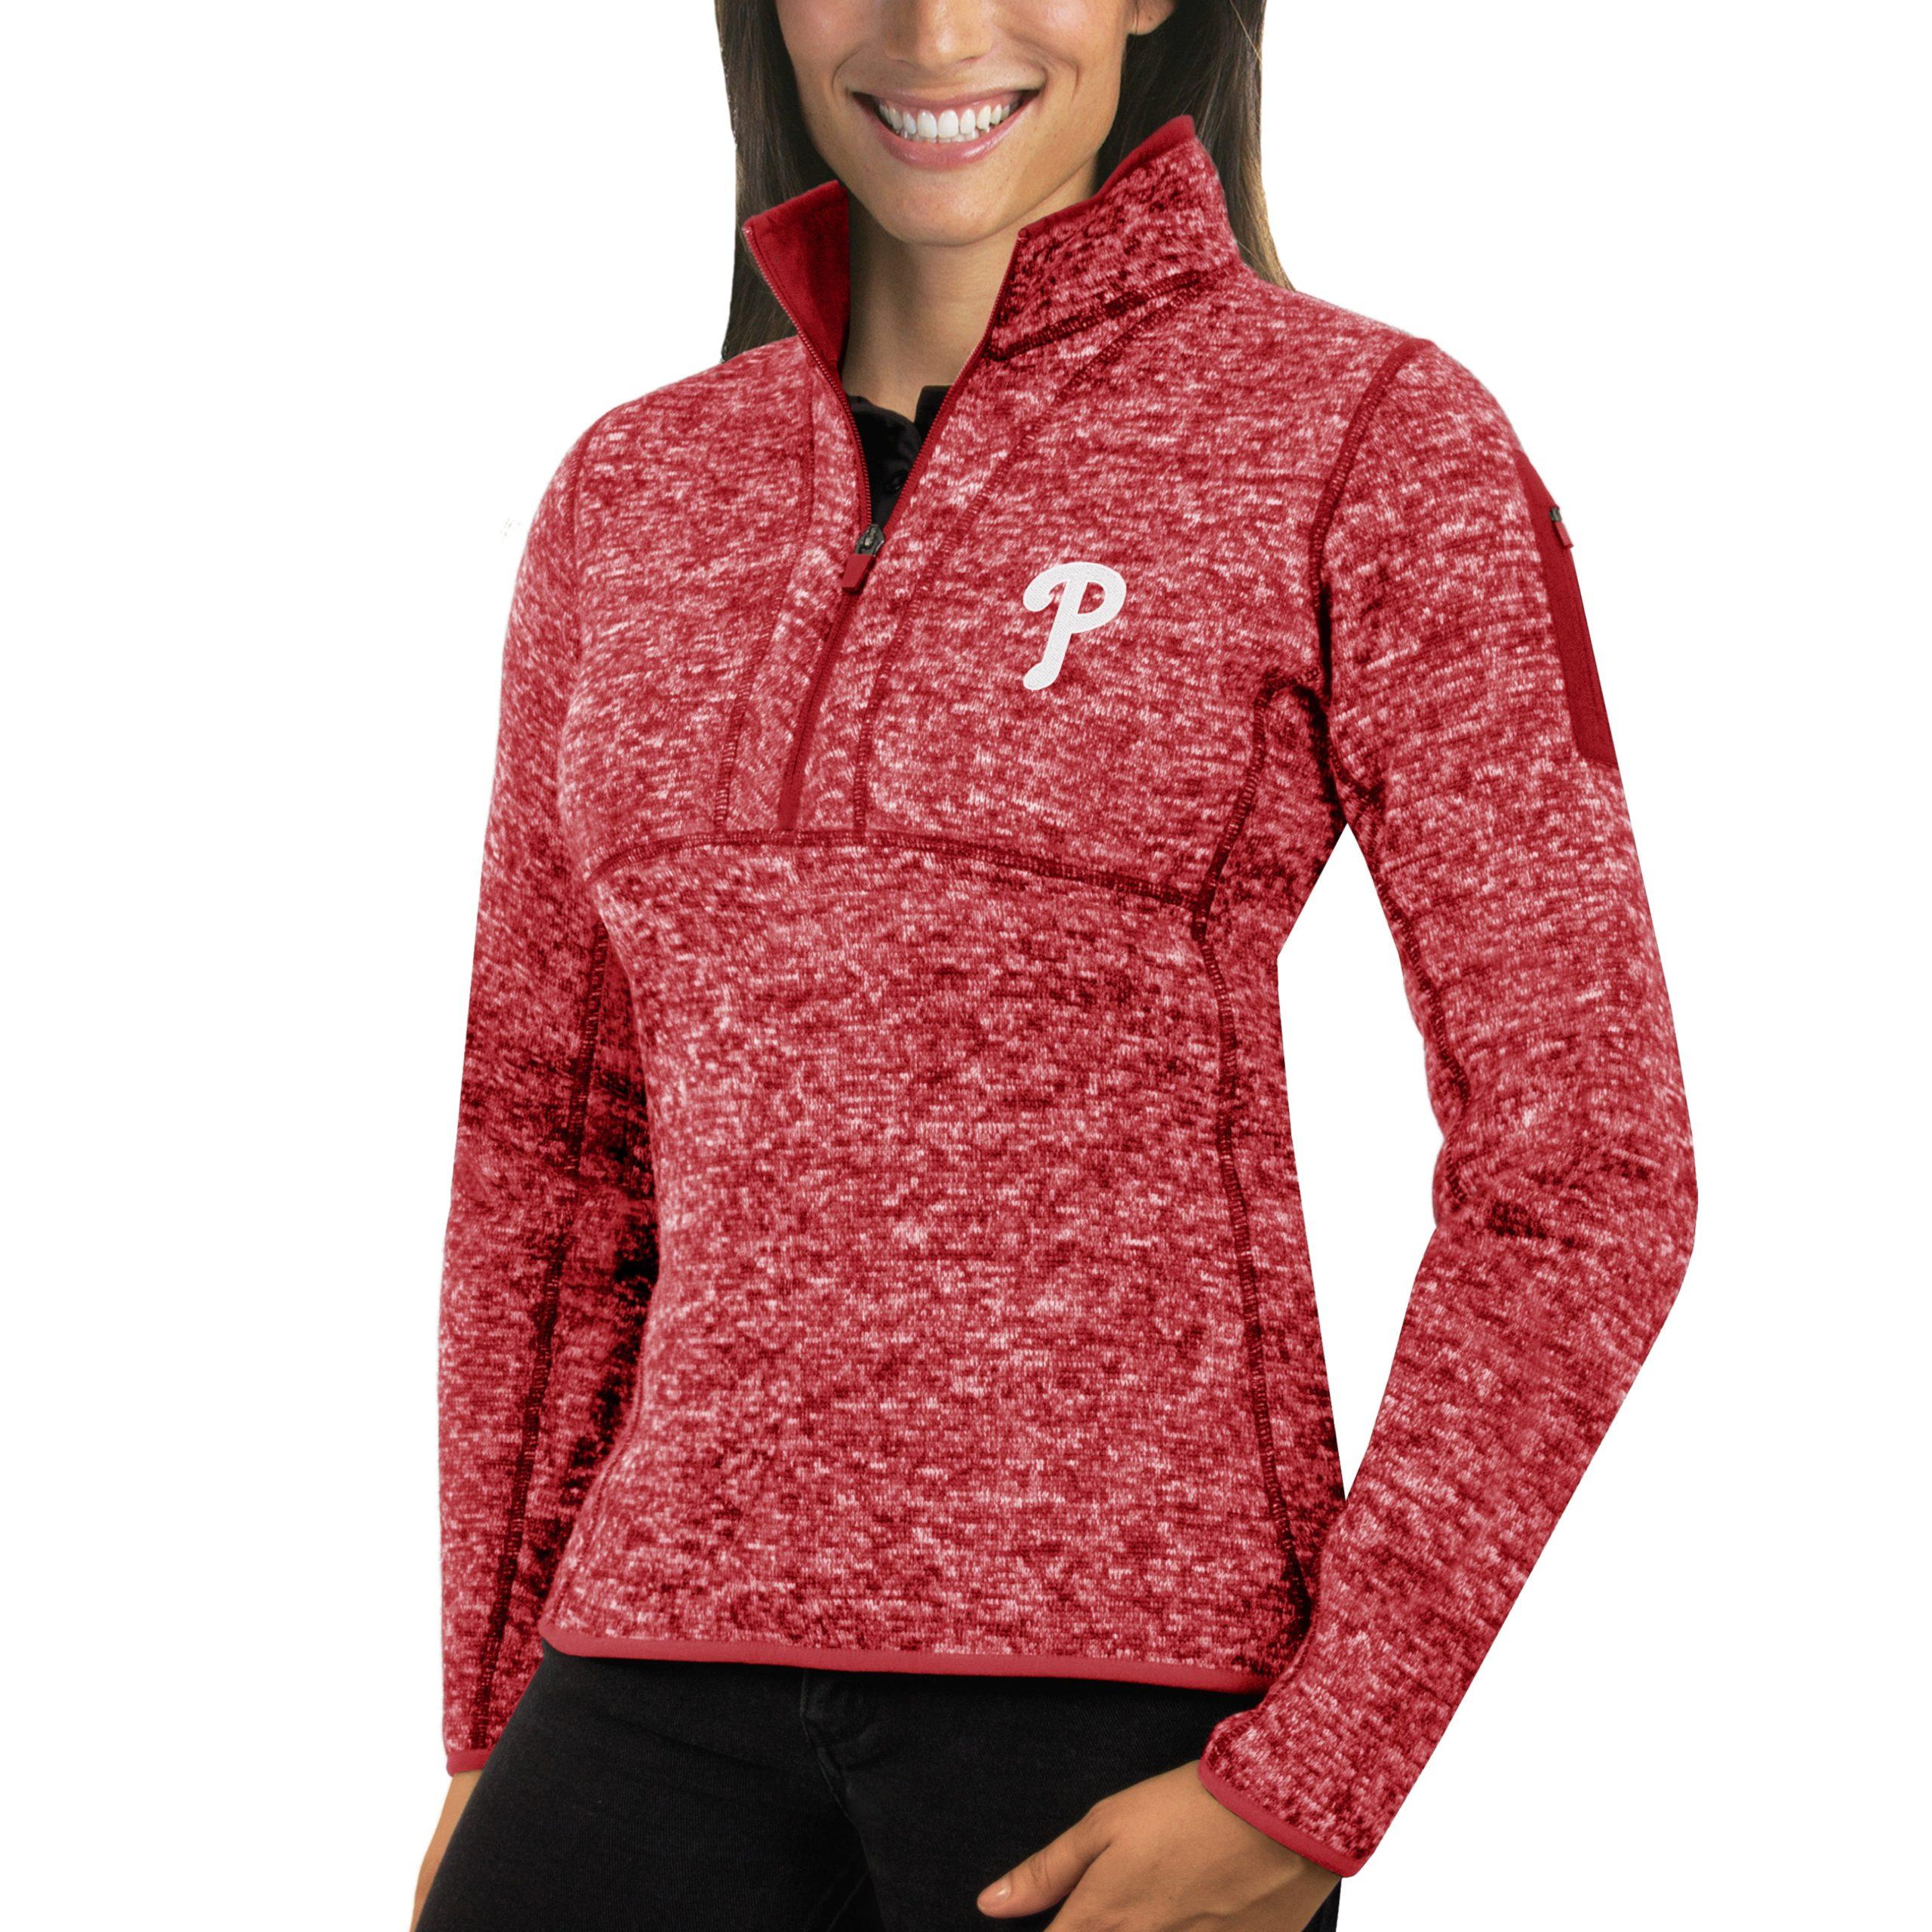 Philadelphia Phillies Antigua Women's Fortune Half-Zip Pullover Sweater - Heathered Red